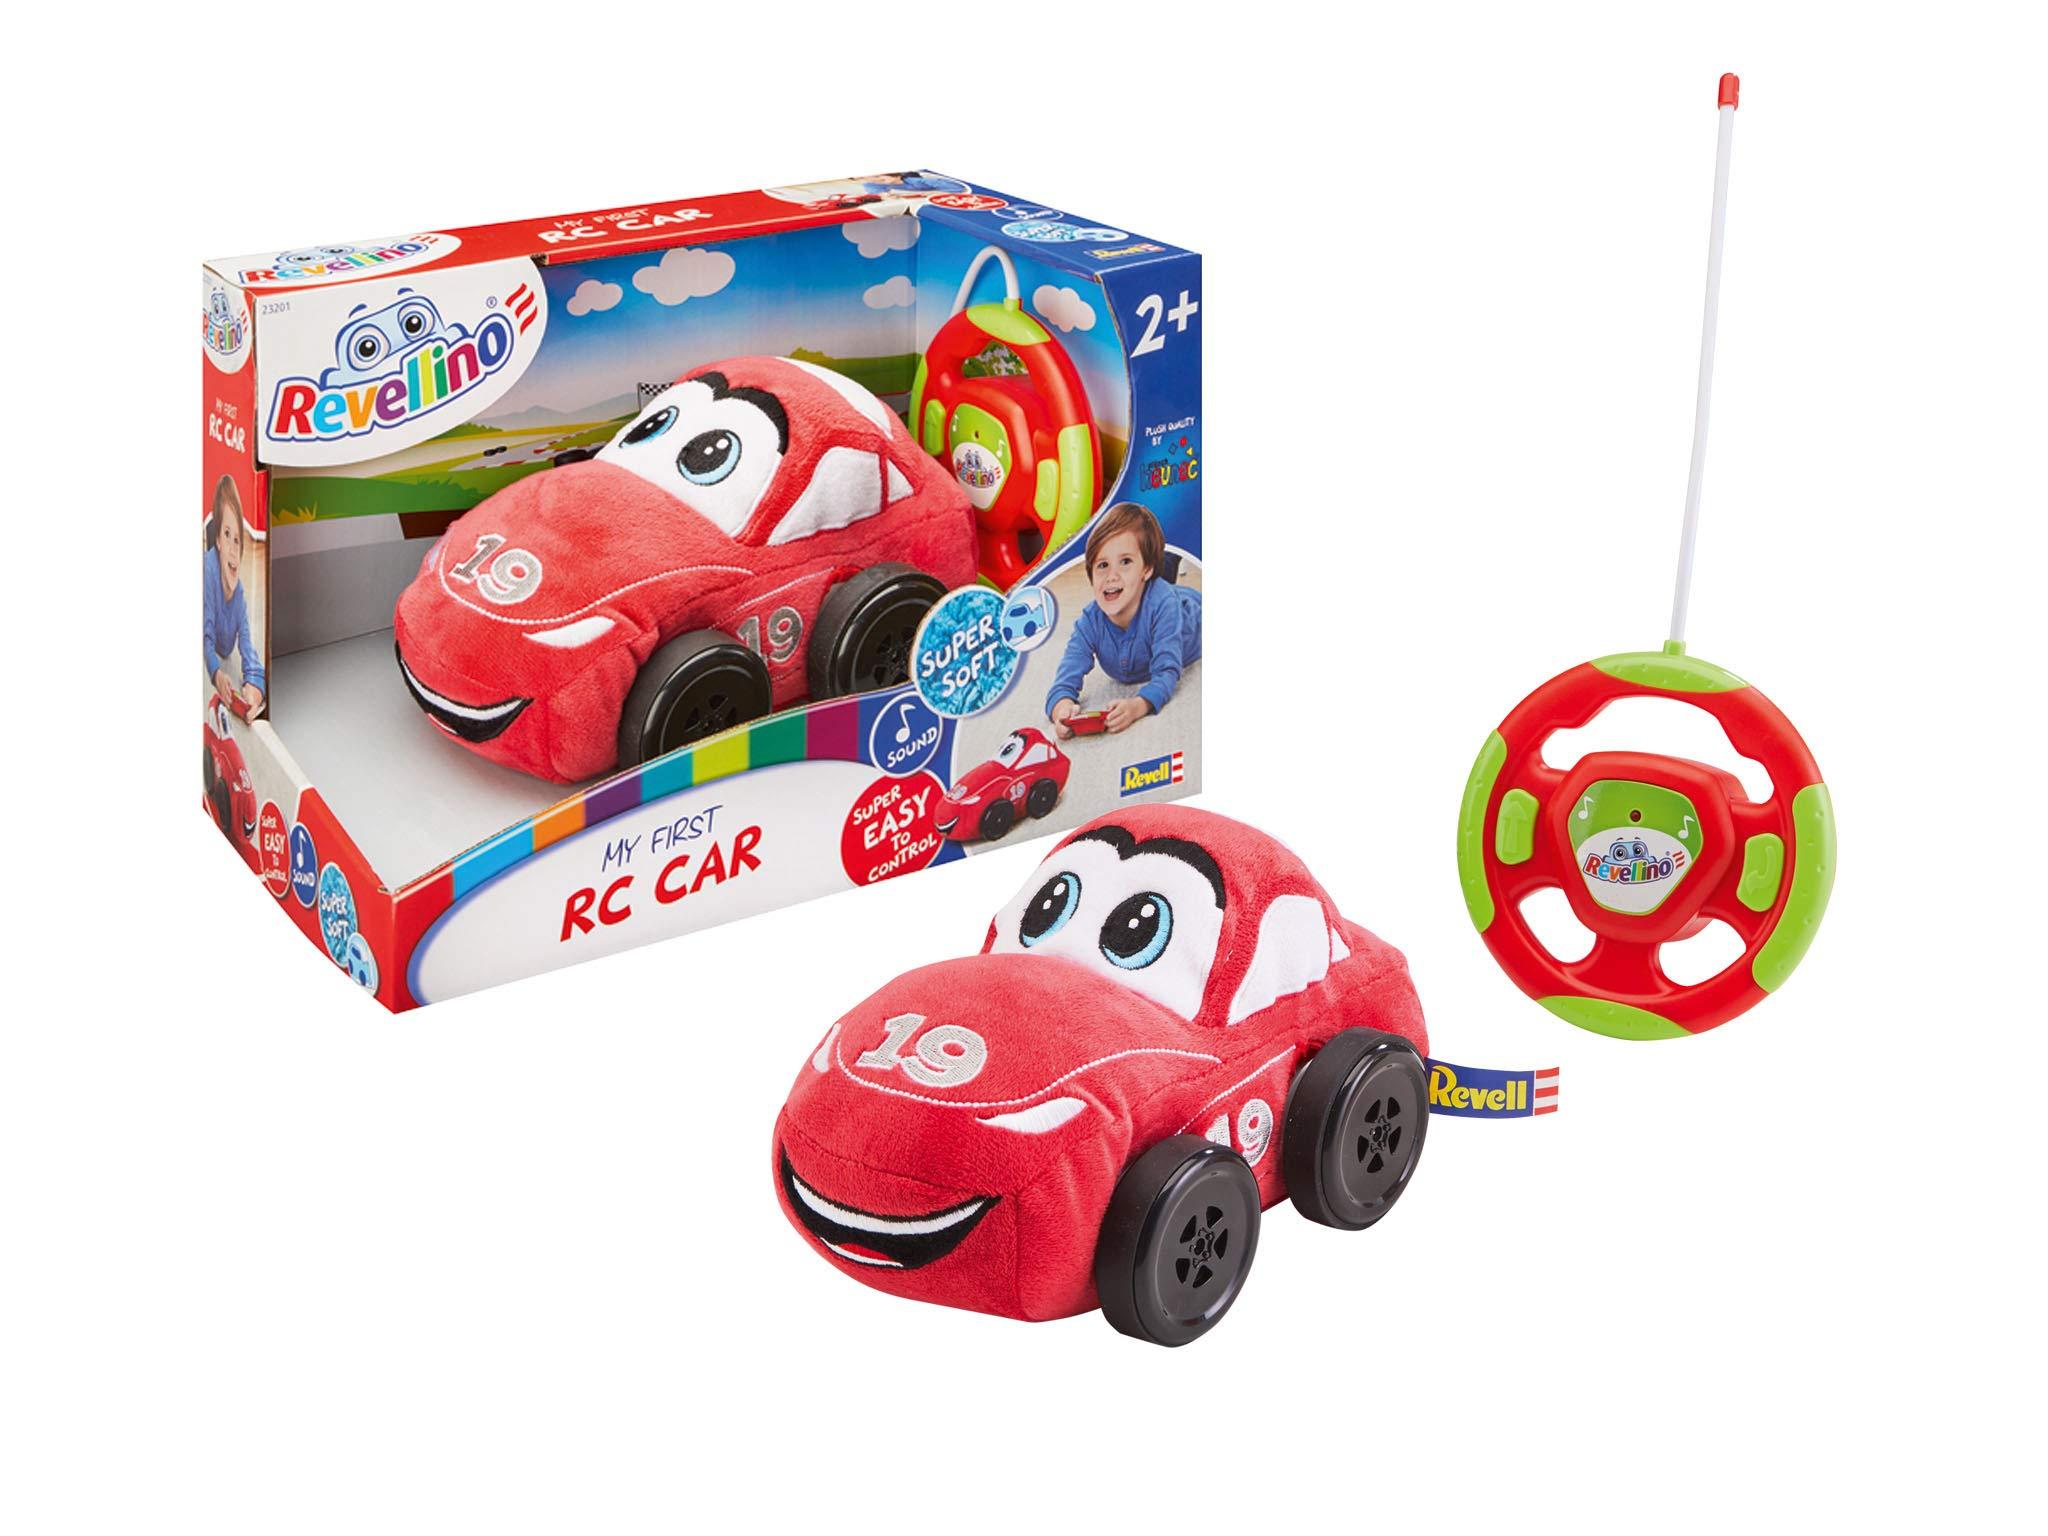 Revell 23201 Revellino - Ma première Voiture de Course radiocommandée Radio Controlled Car, Red